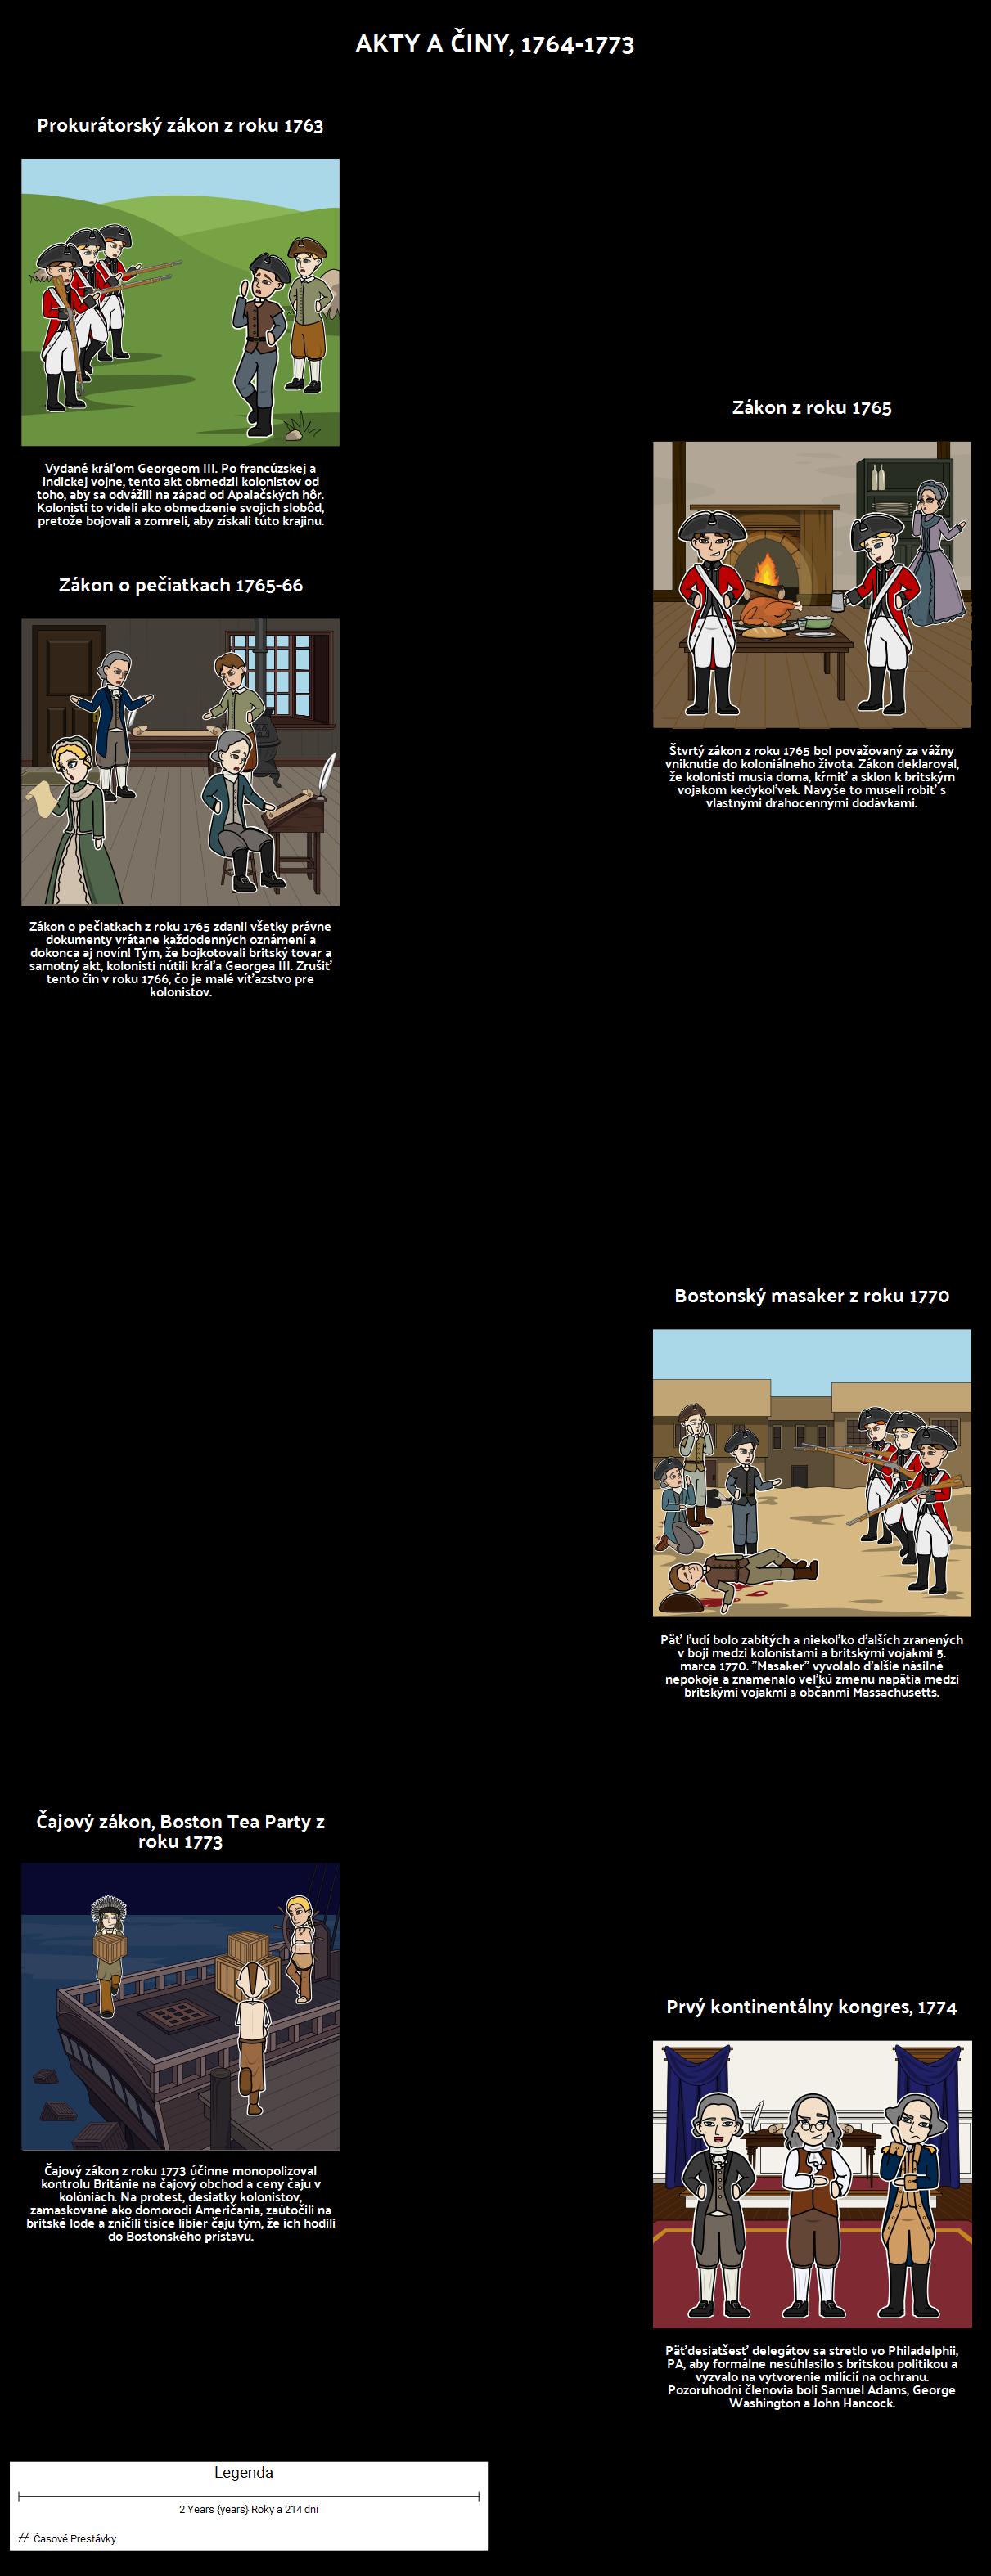 Akty a činy 13 kolónií: 1764-1773